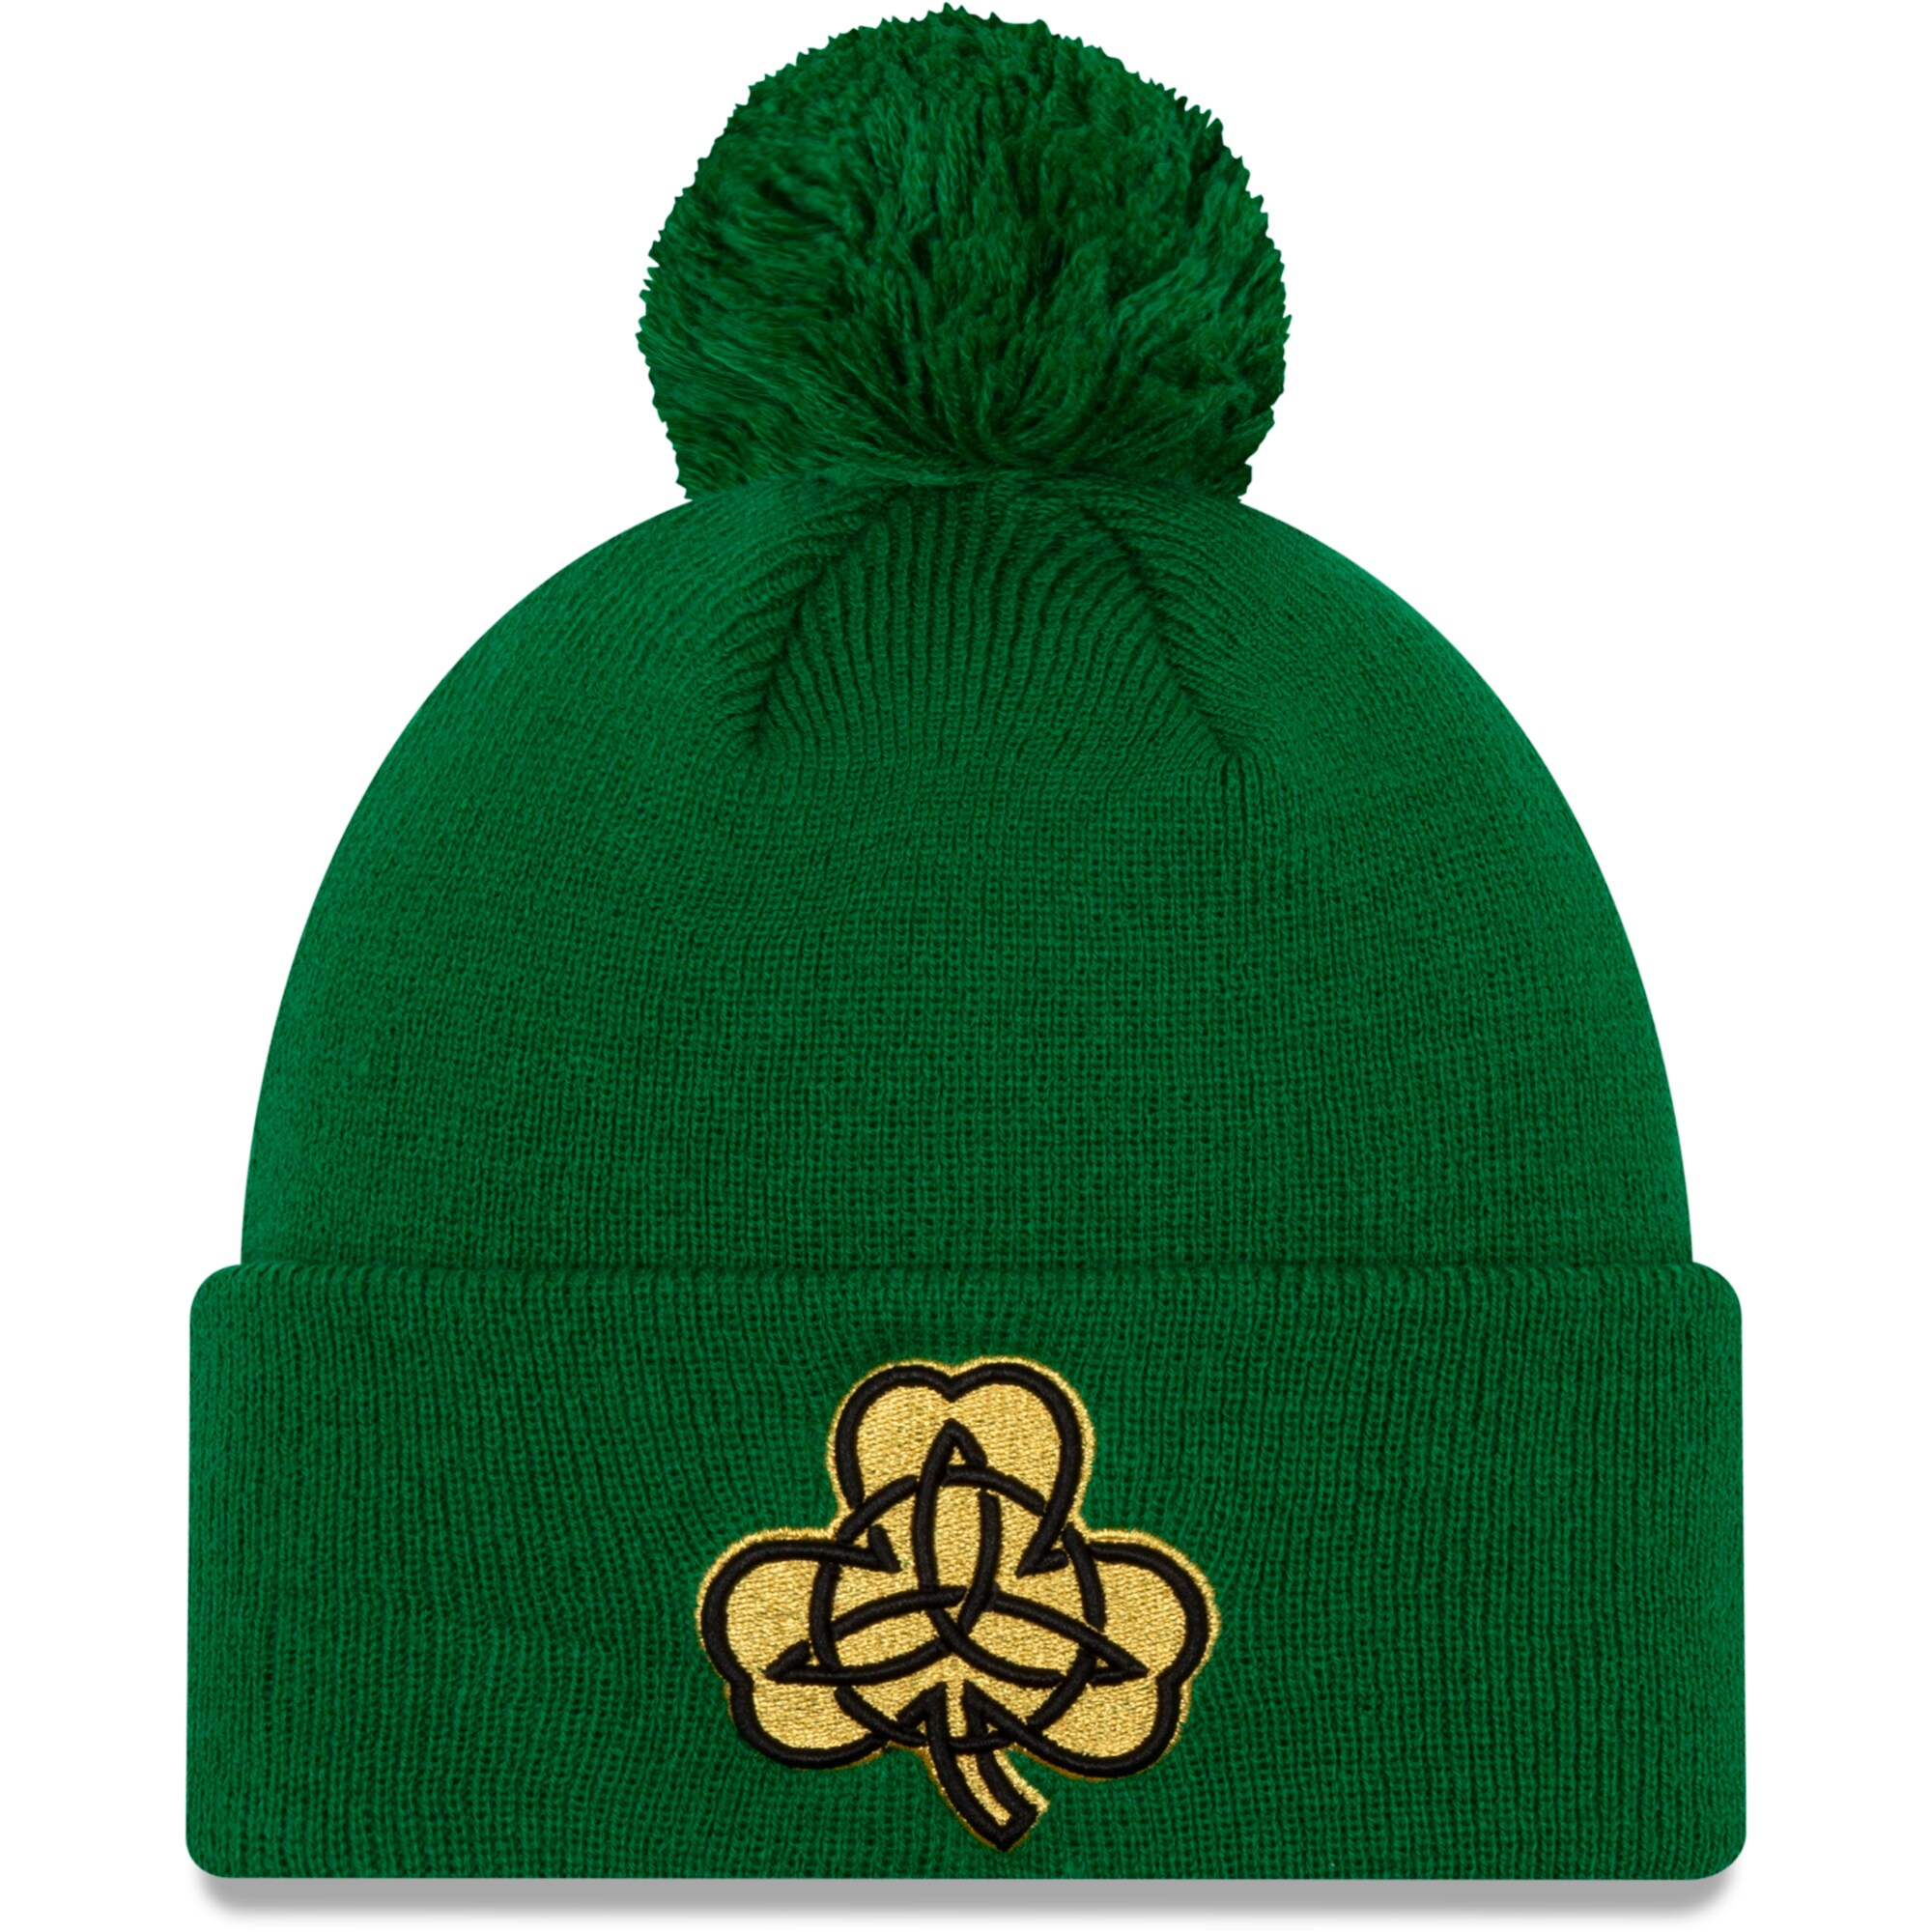 Boston Celtics New Era 2019/20 City Edition Pom Knit Hat - Green